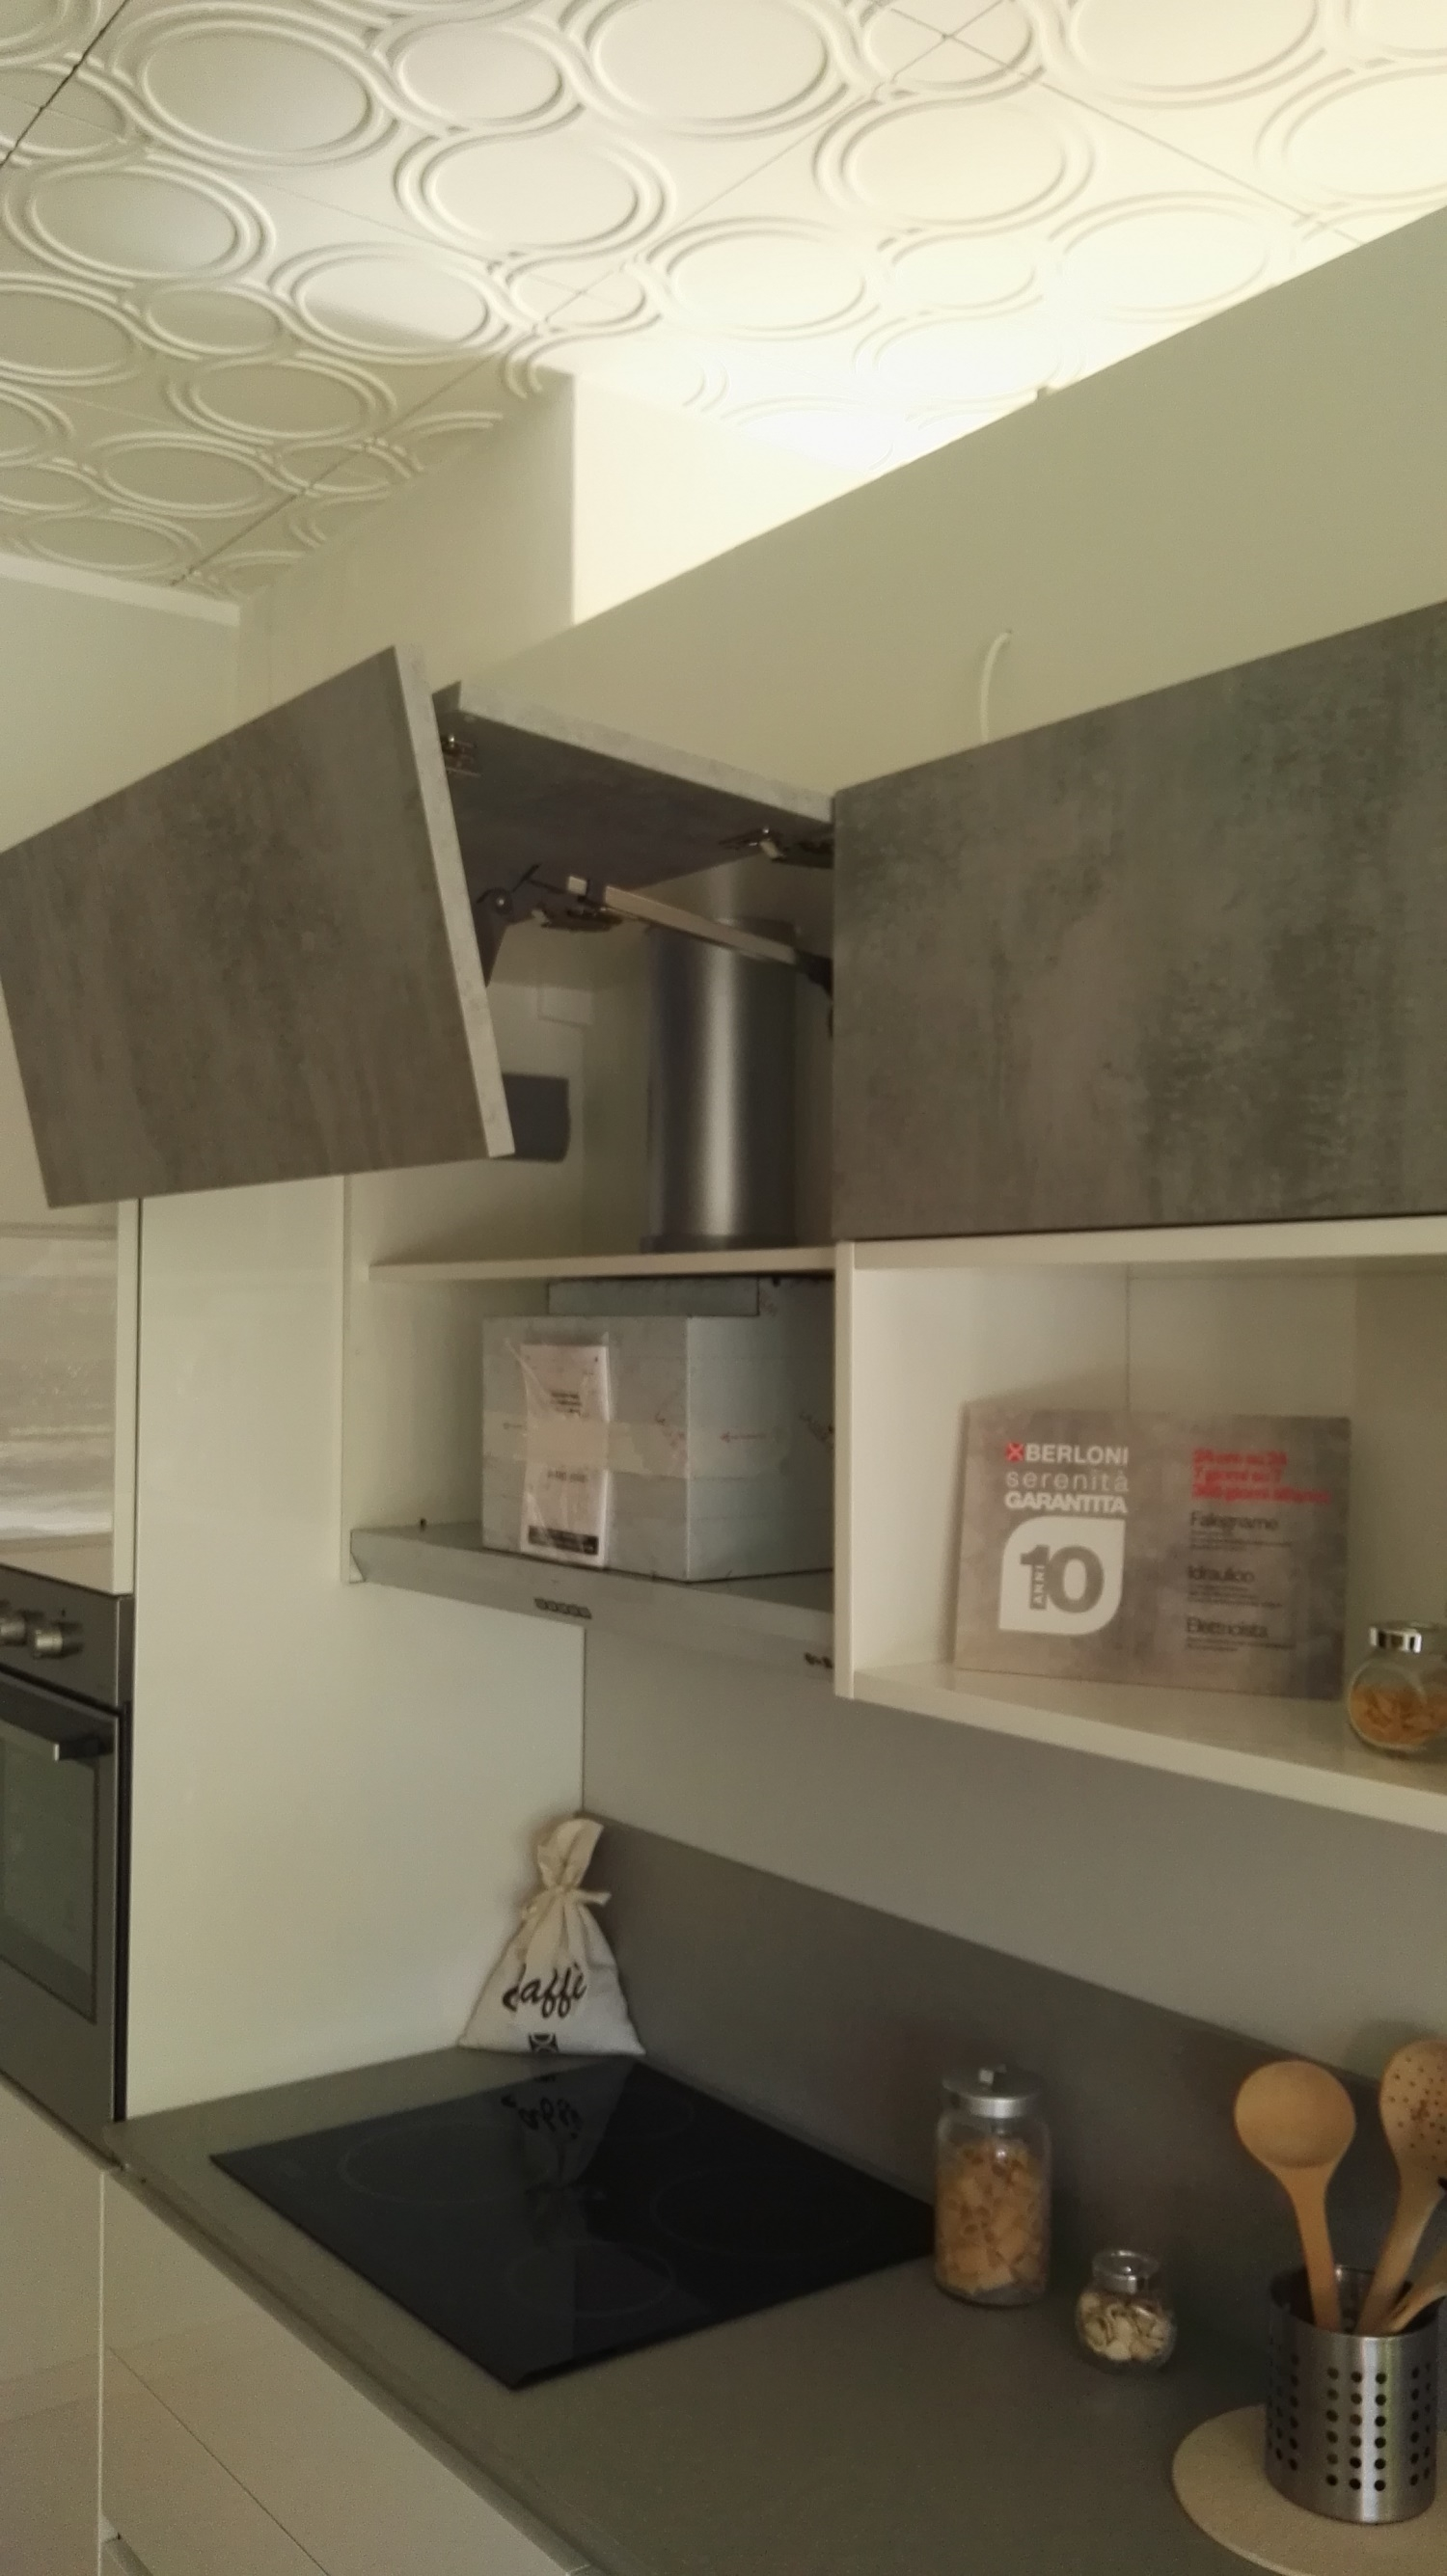 Berloni Cucine Cucina B50 berloni scontato del -43 % - Cucine a ...